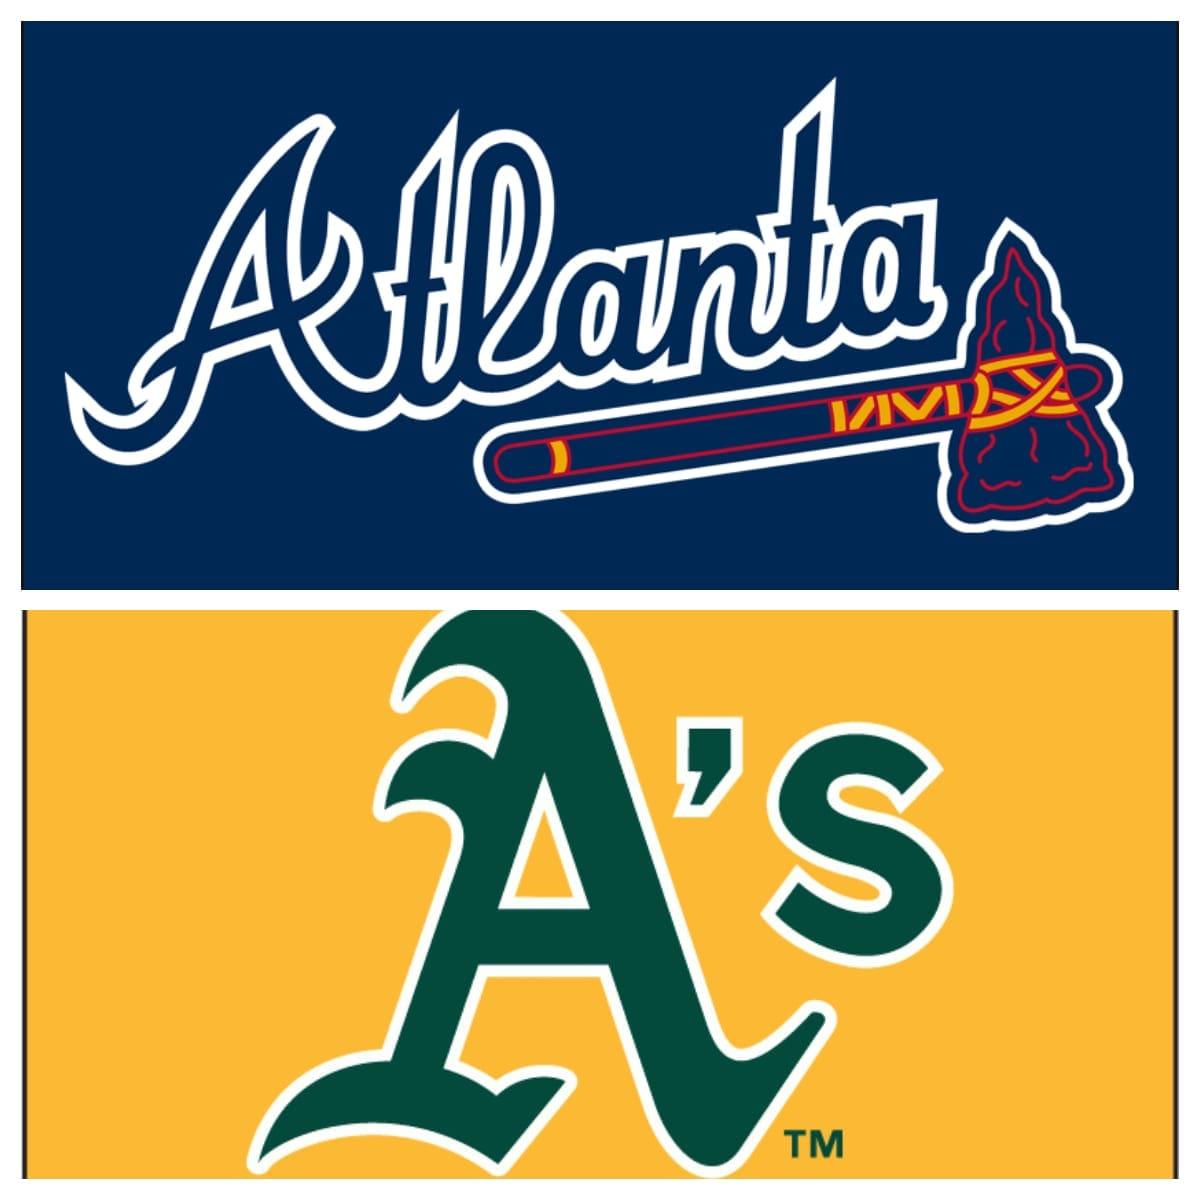 Atlanta Braves vs Oakland Athletics Stats